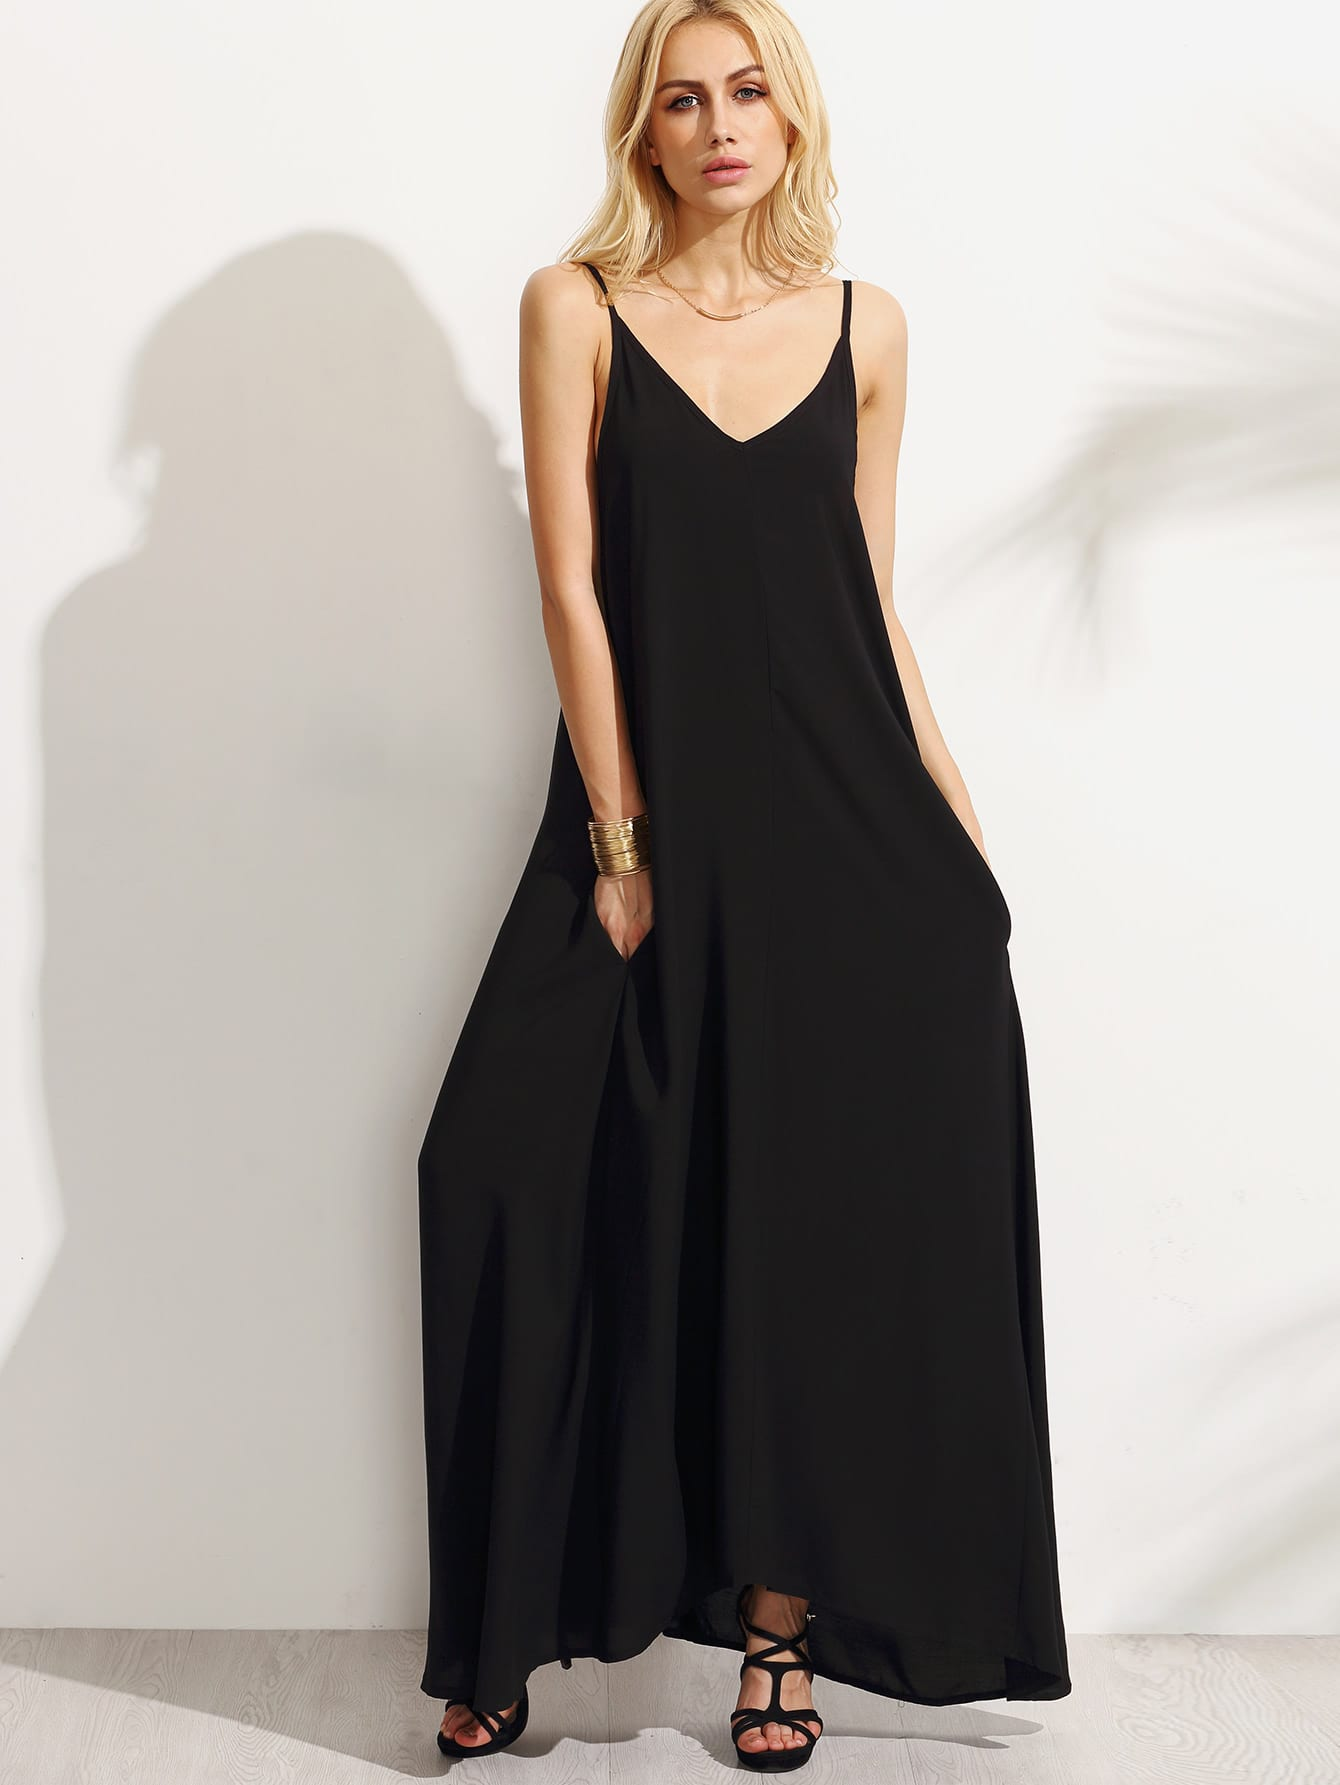 Black Spaghetti Strap  Maxi DressBlack Spaghetti Strap  Maxi Dress<br><br>color: Black<br>size: L,M,S,XL